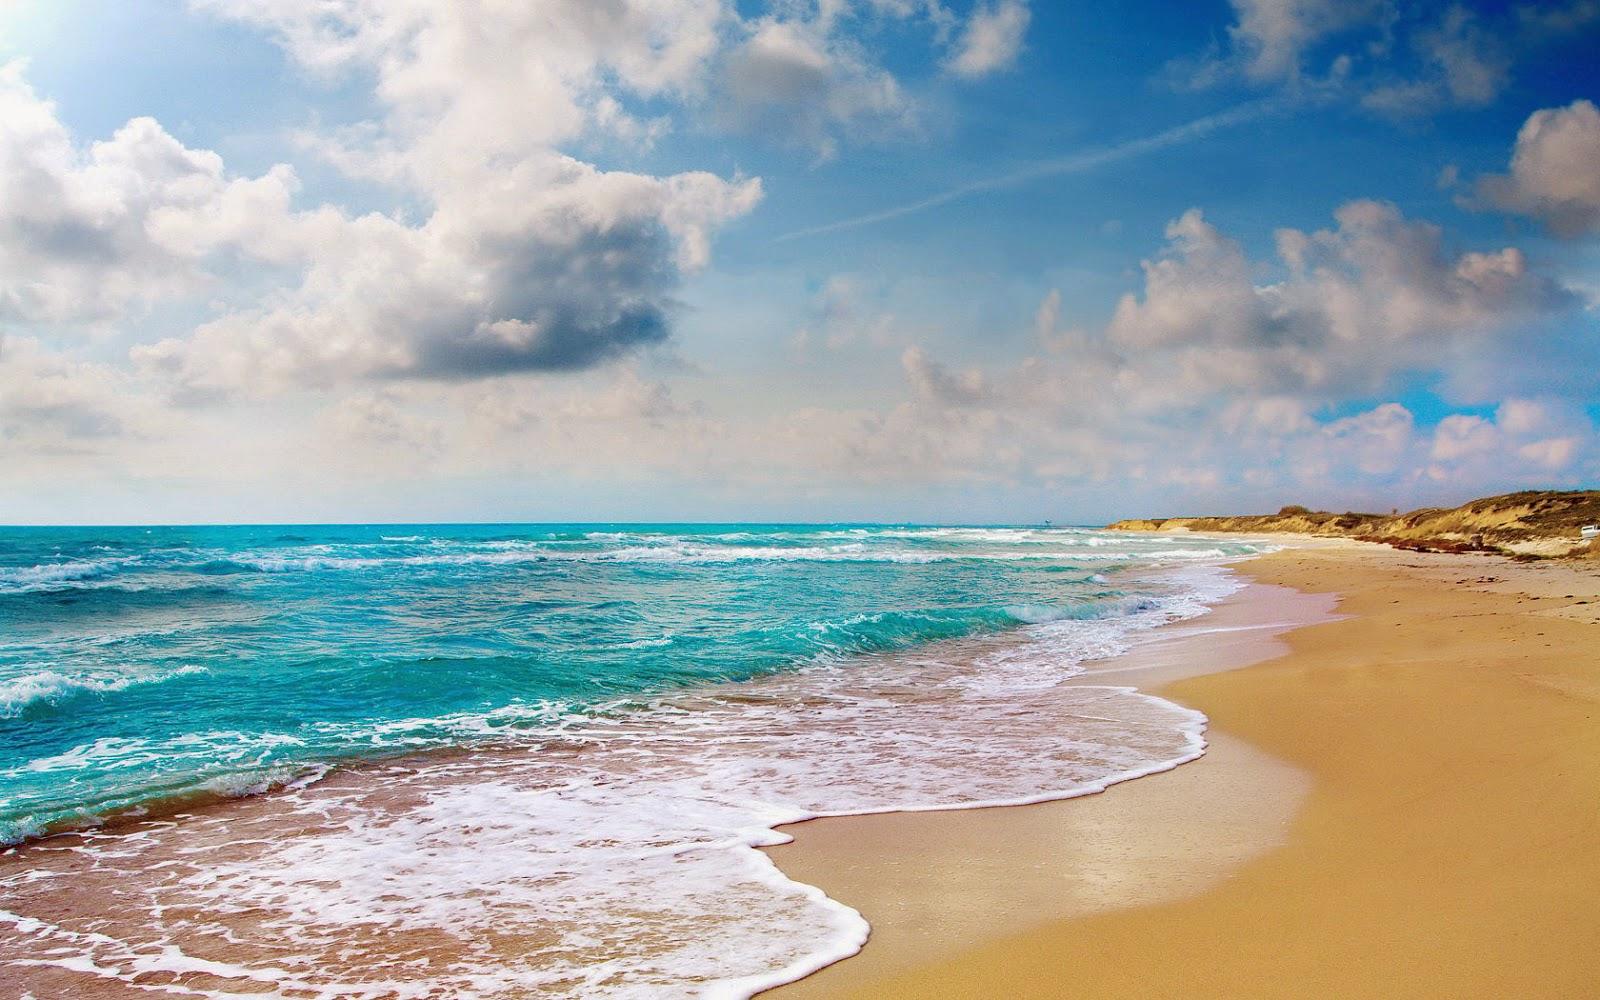 Strand Achtergronden | HD Wallpapers